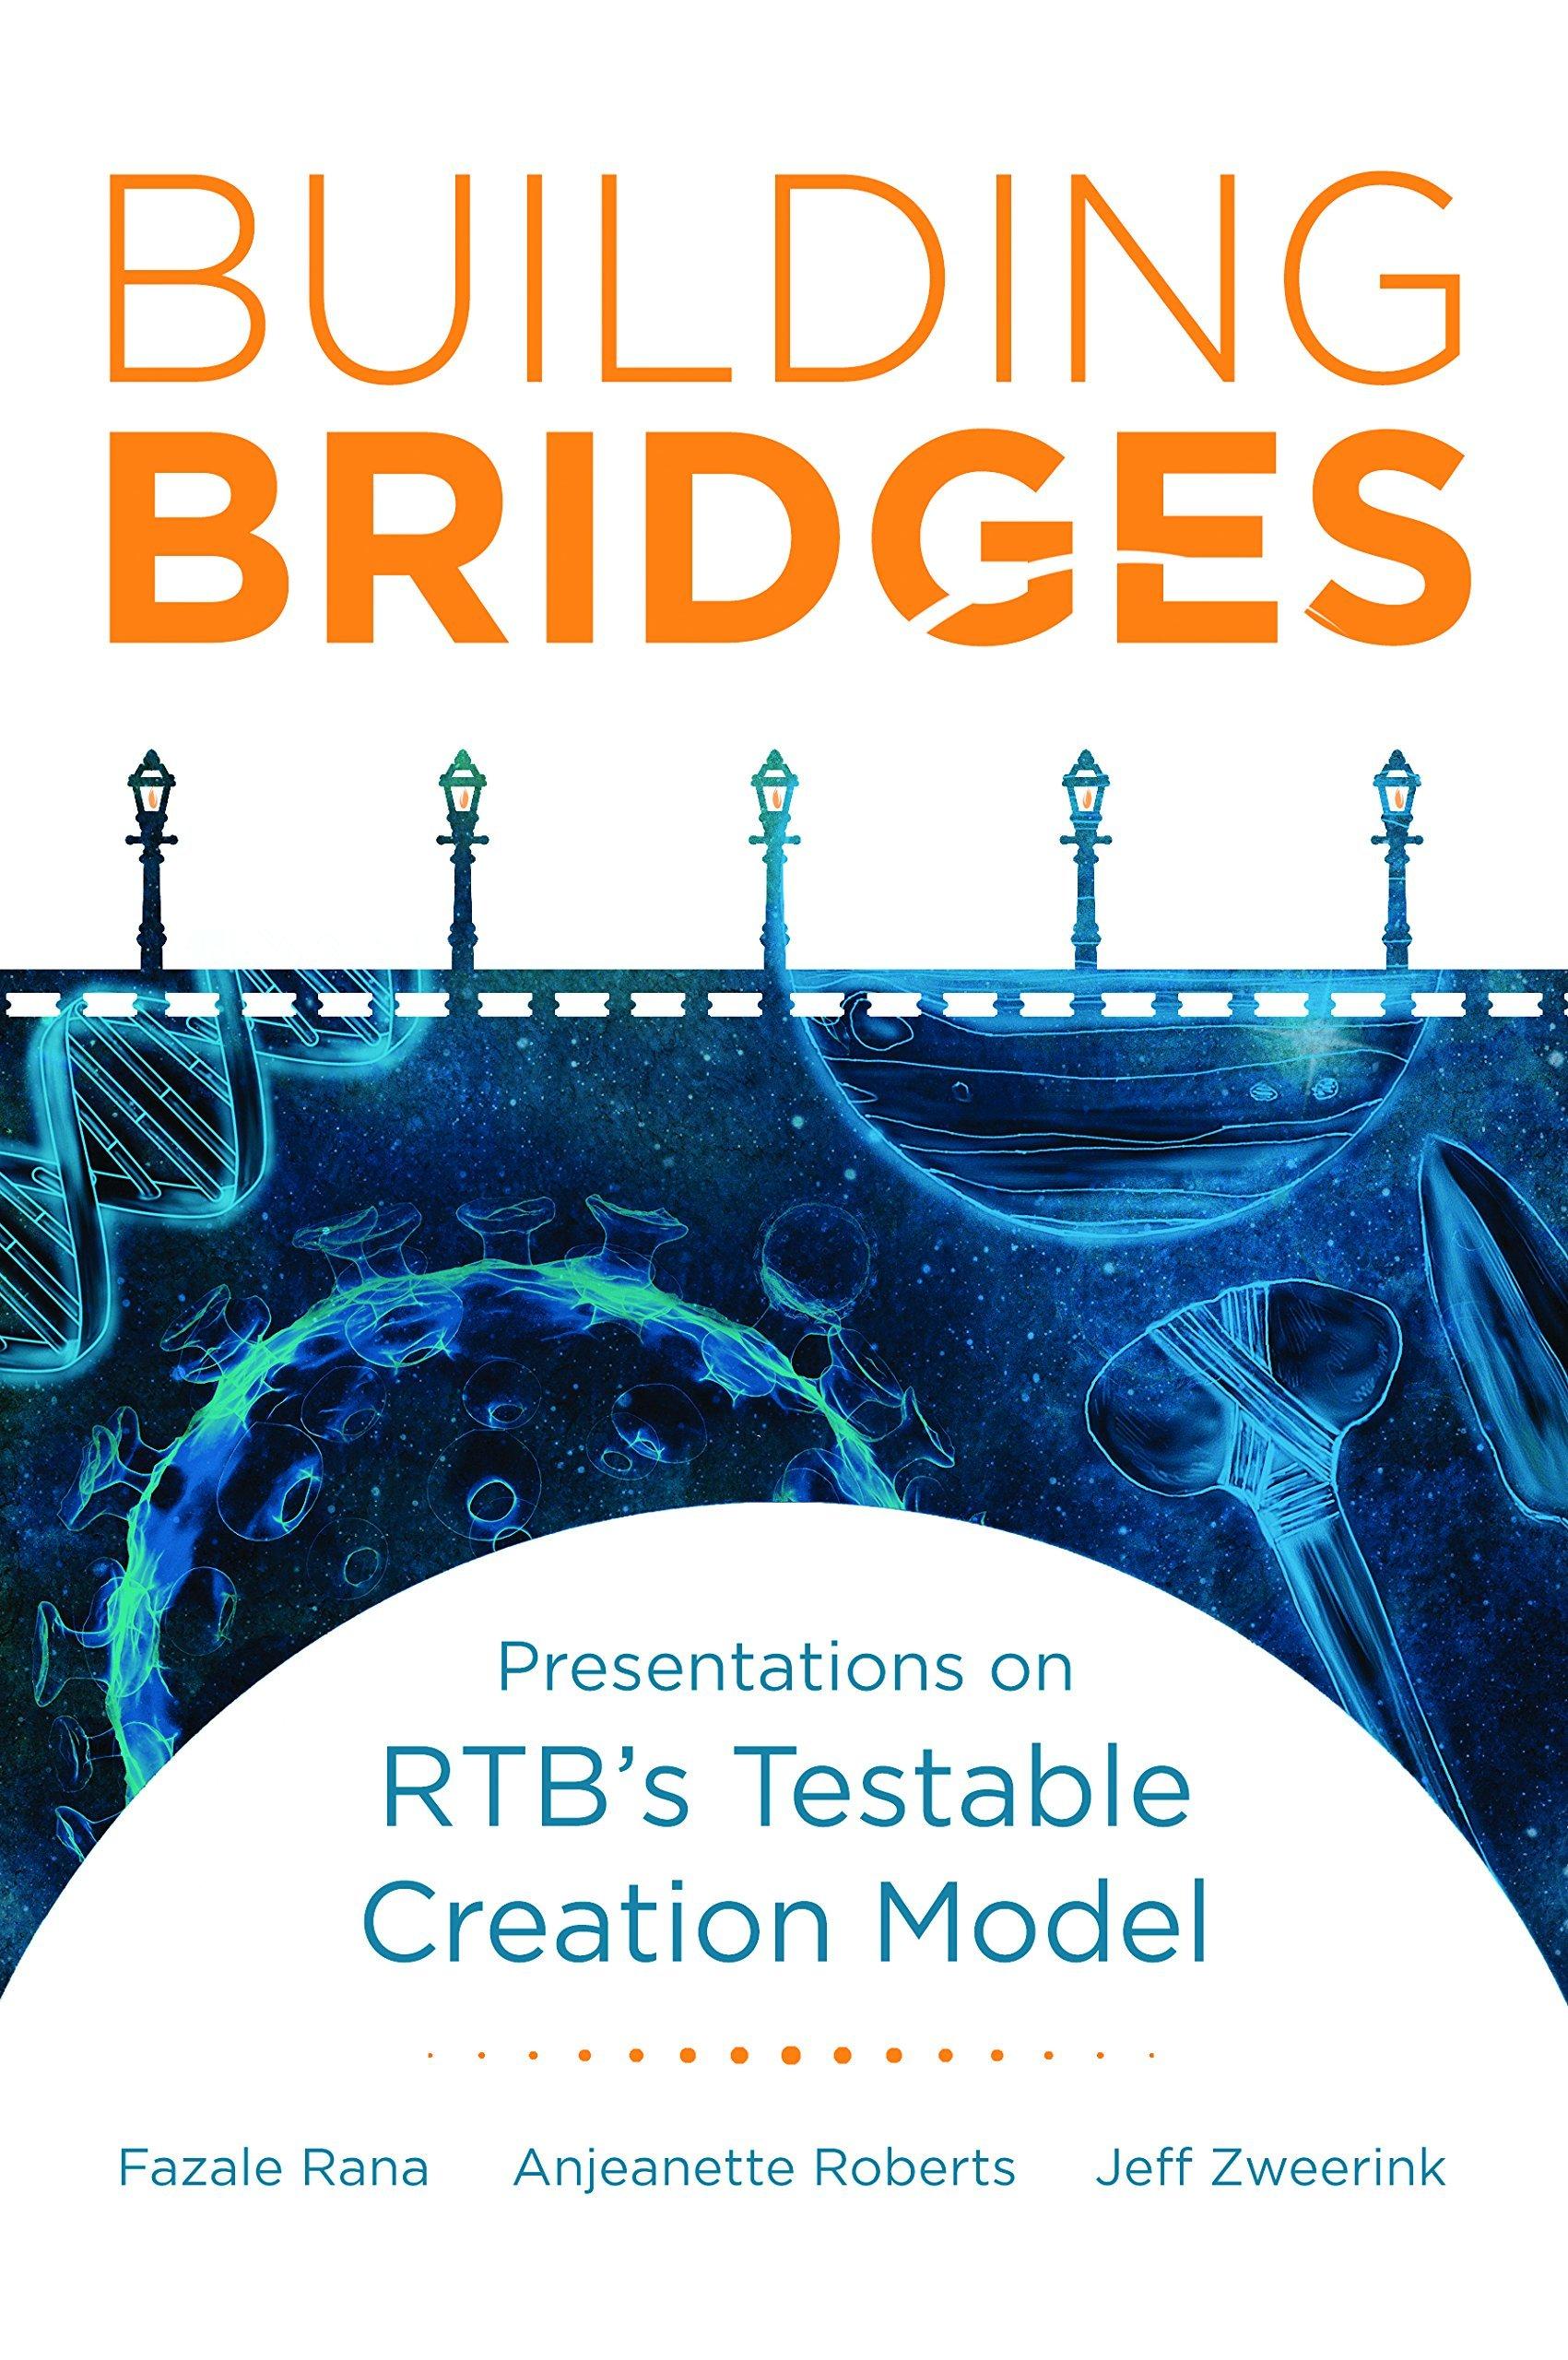 Building Bridges: Presentations on RTB's Testable Creation Model